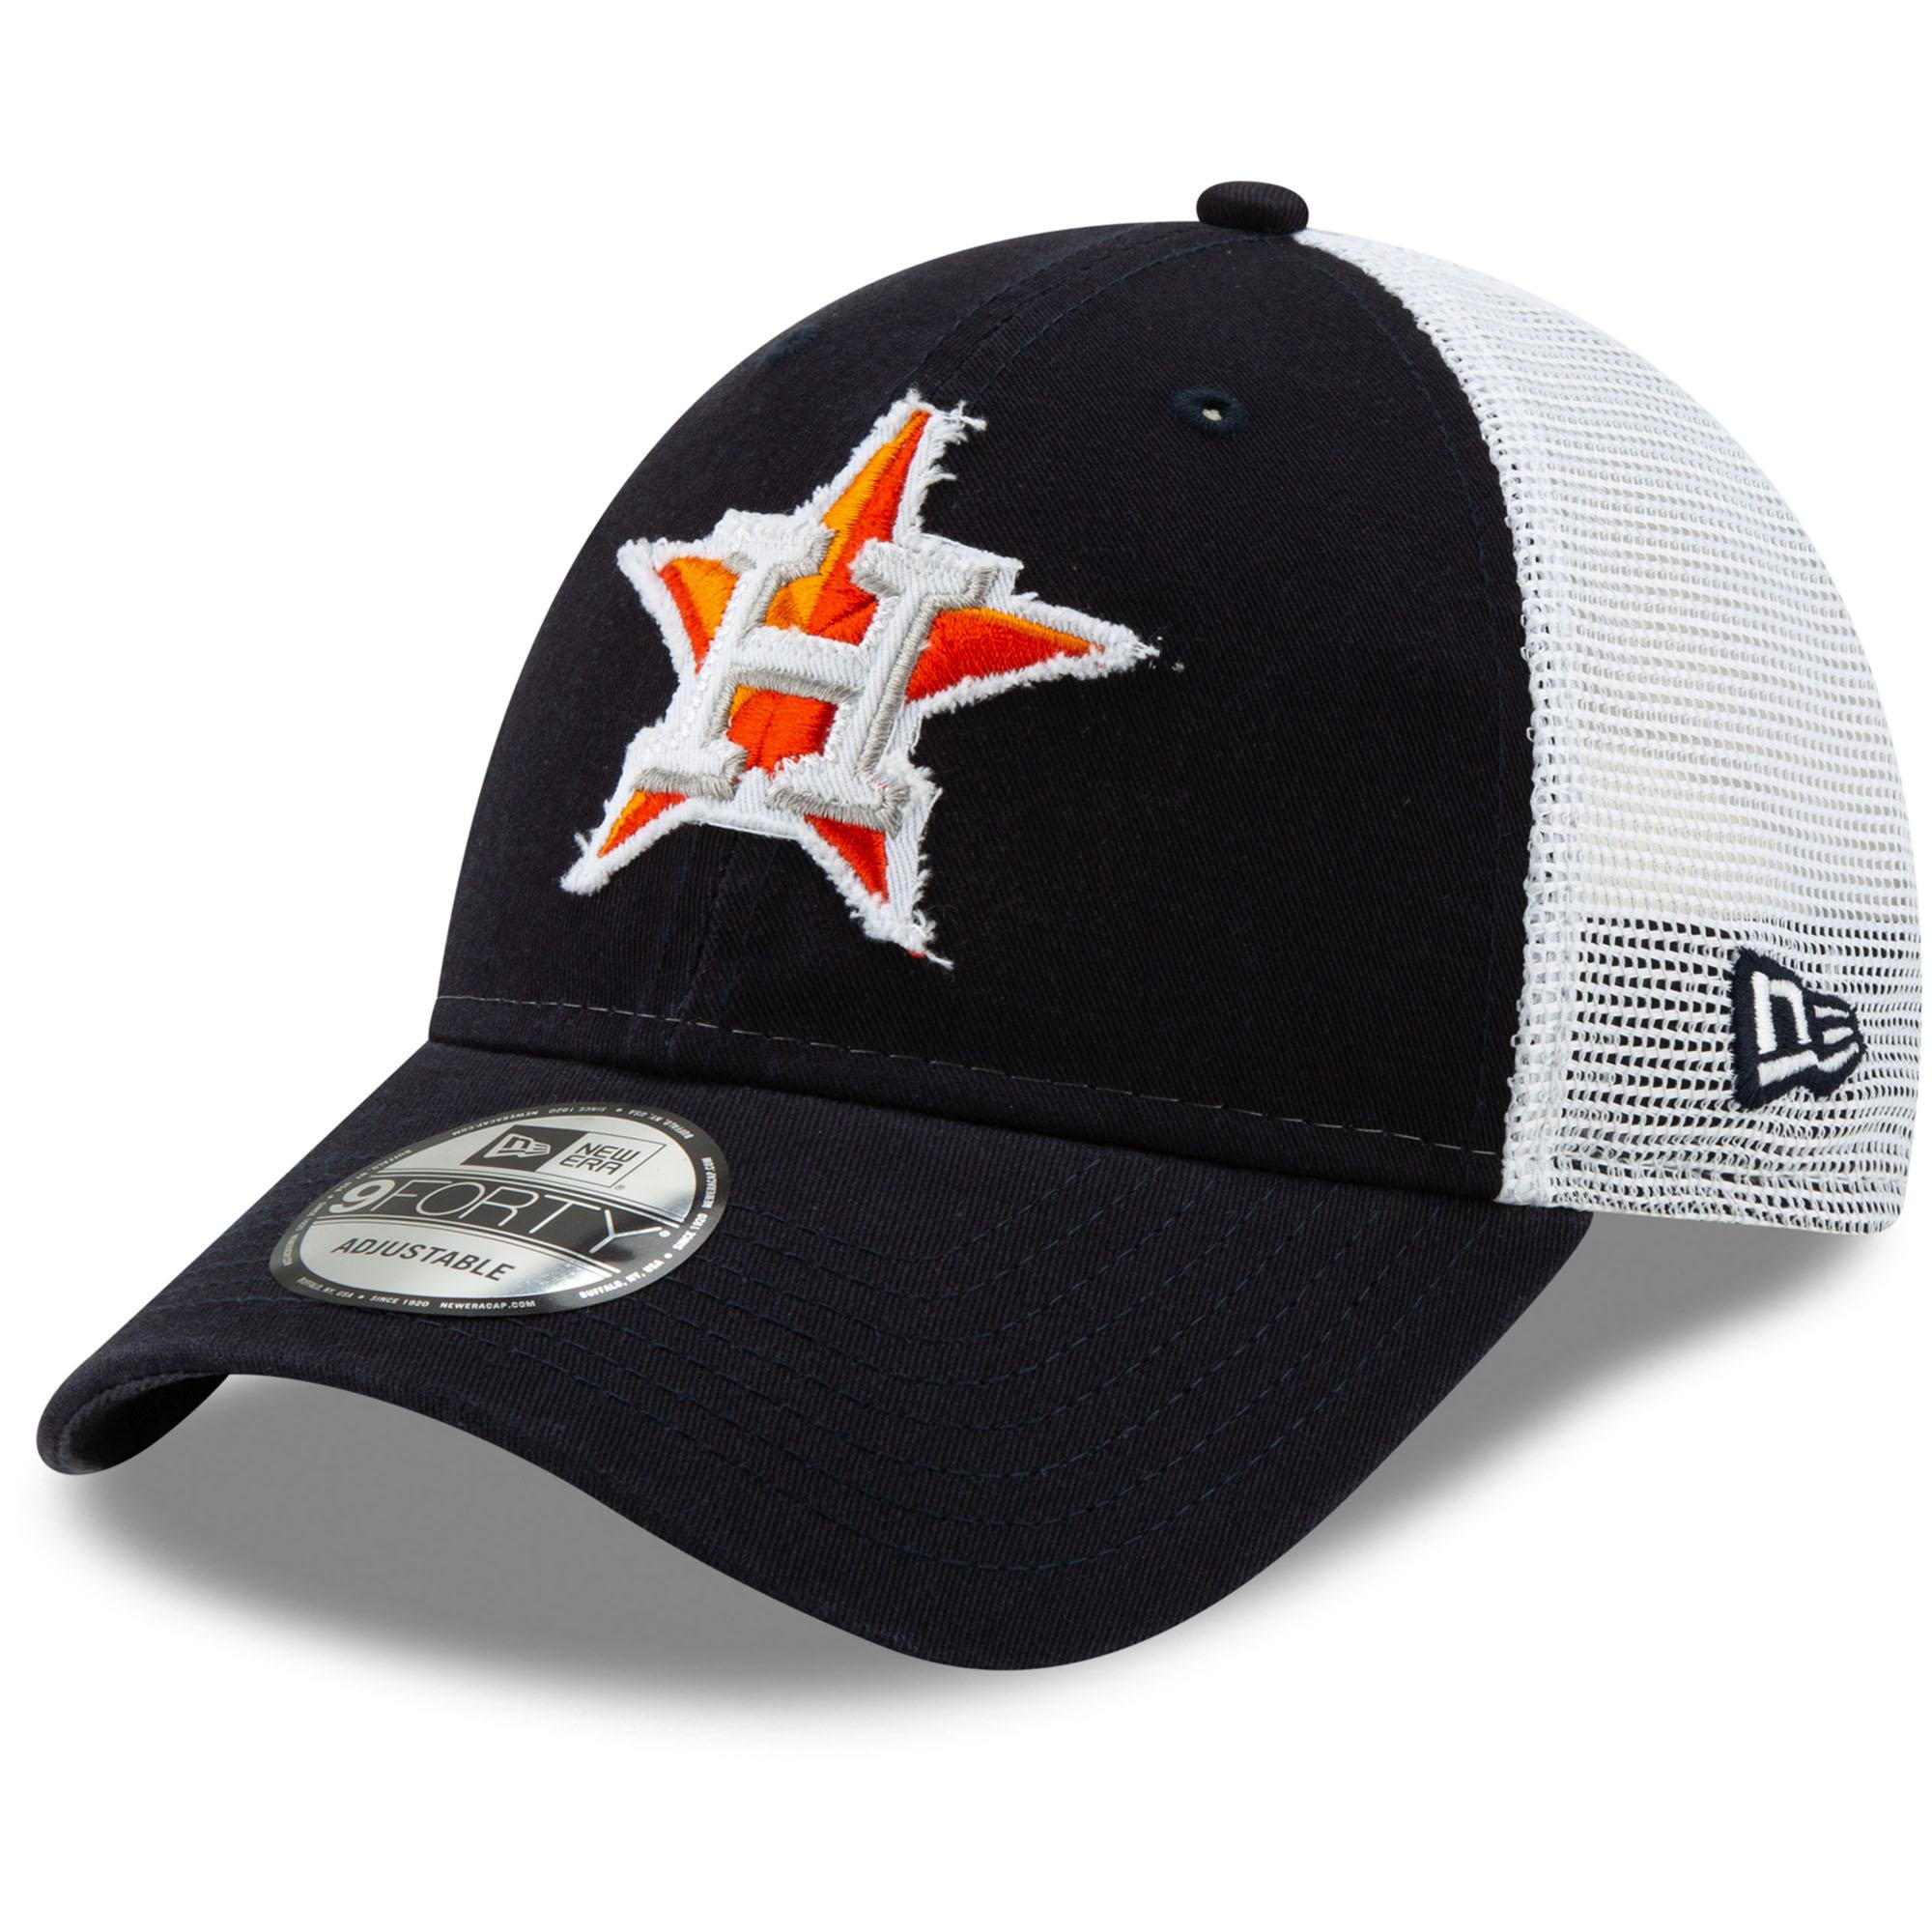 Houston Astros New Era Team Truckered 9FORTY Adjustable Hat - Navy/White - OSFA